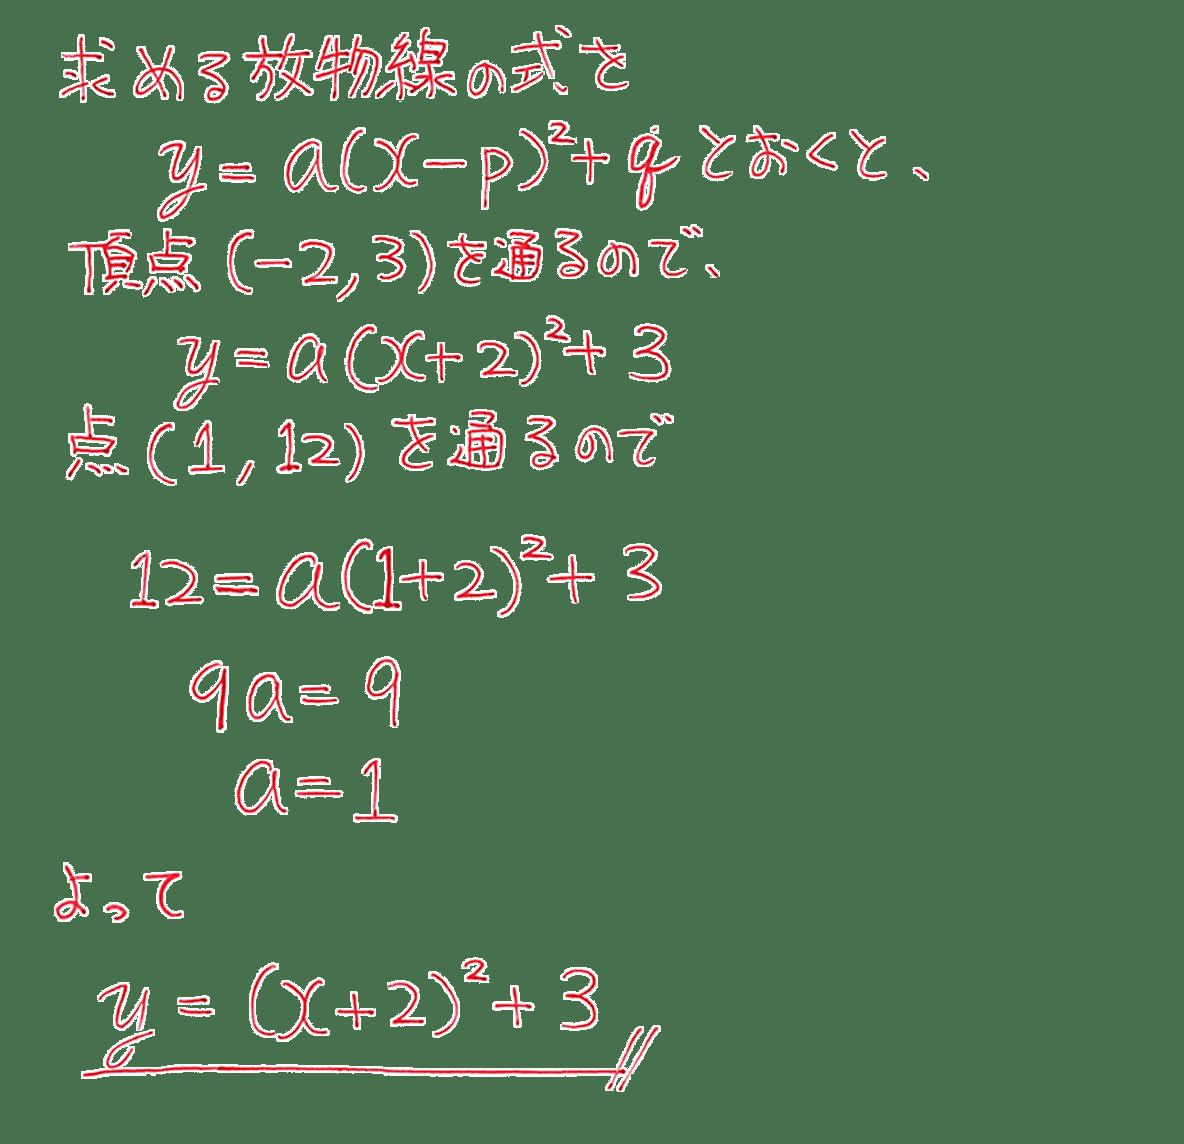 高校数学Ⅰ 2次関数25 練習の答え